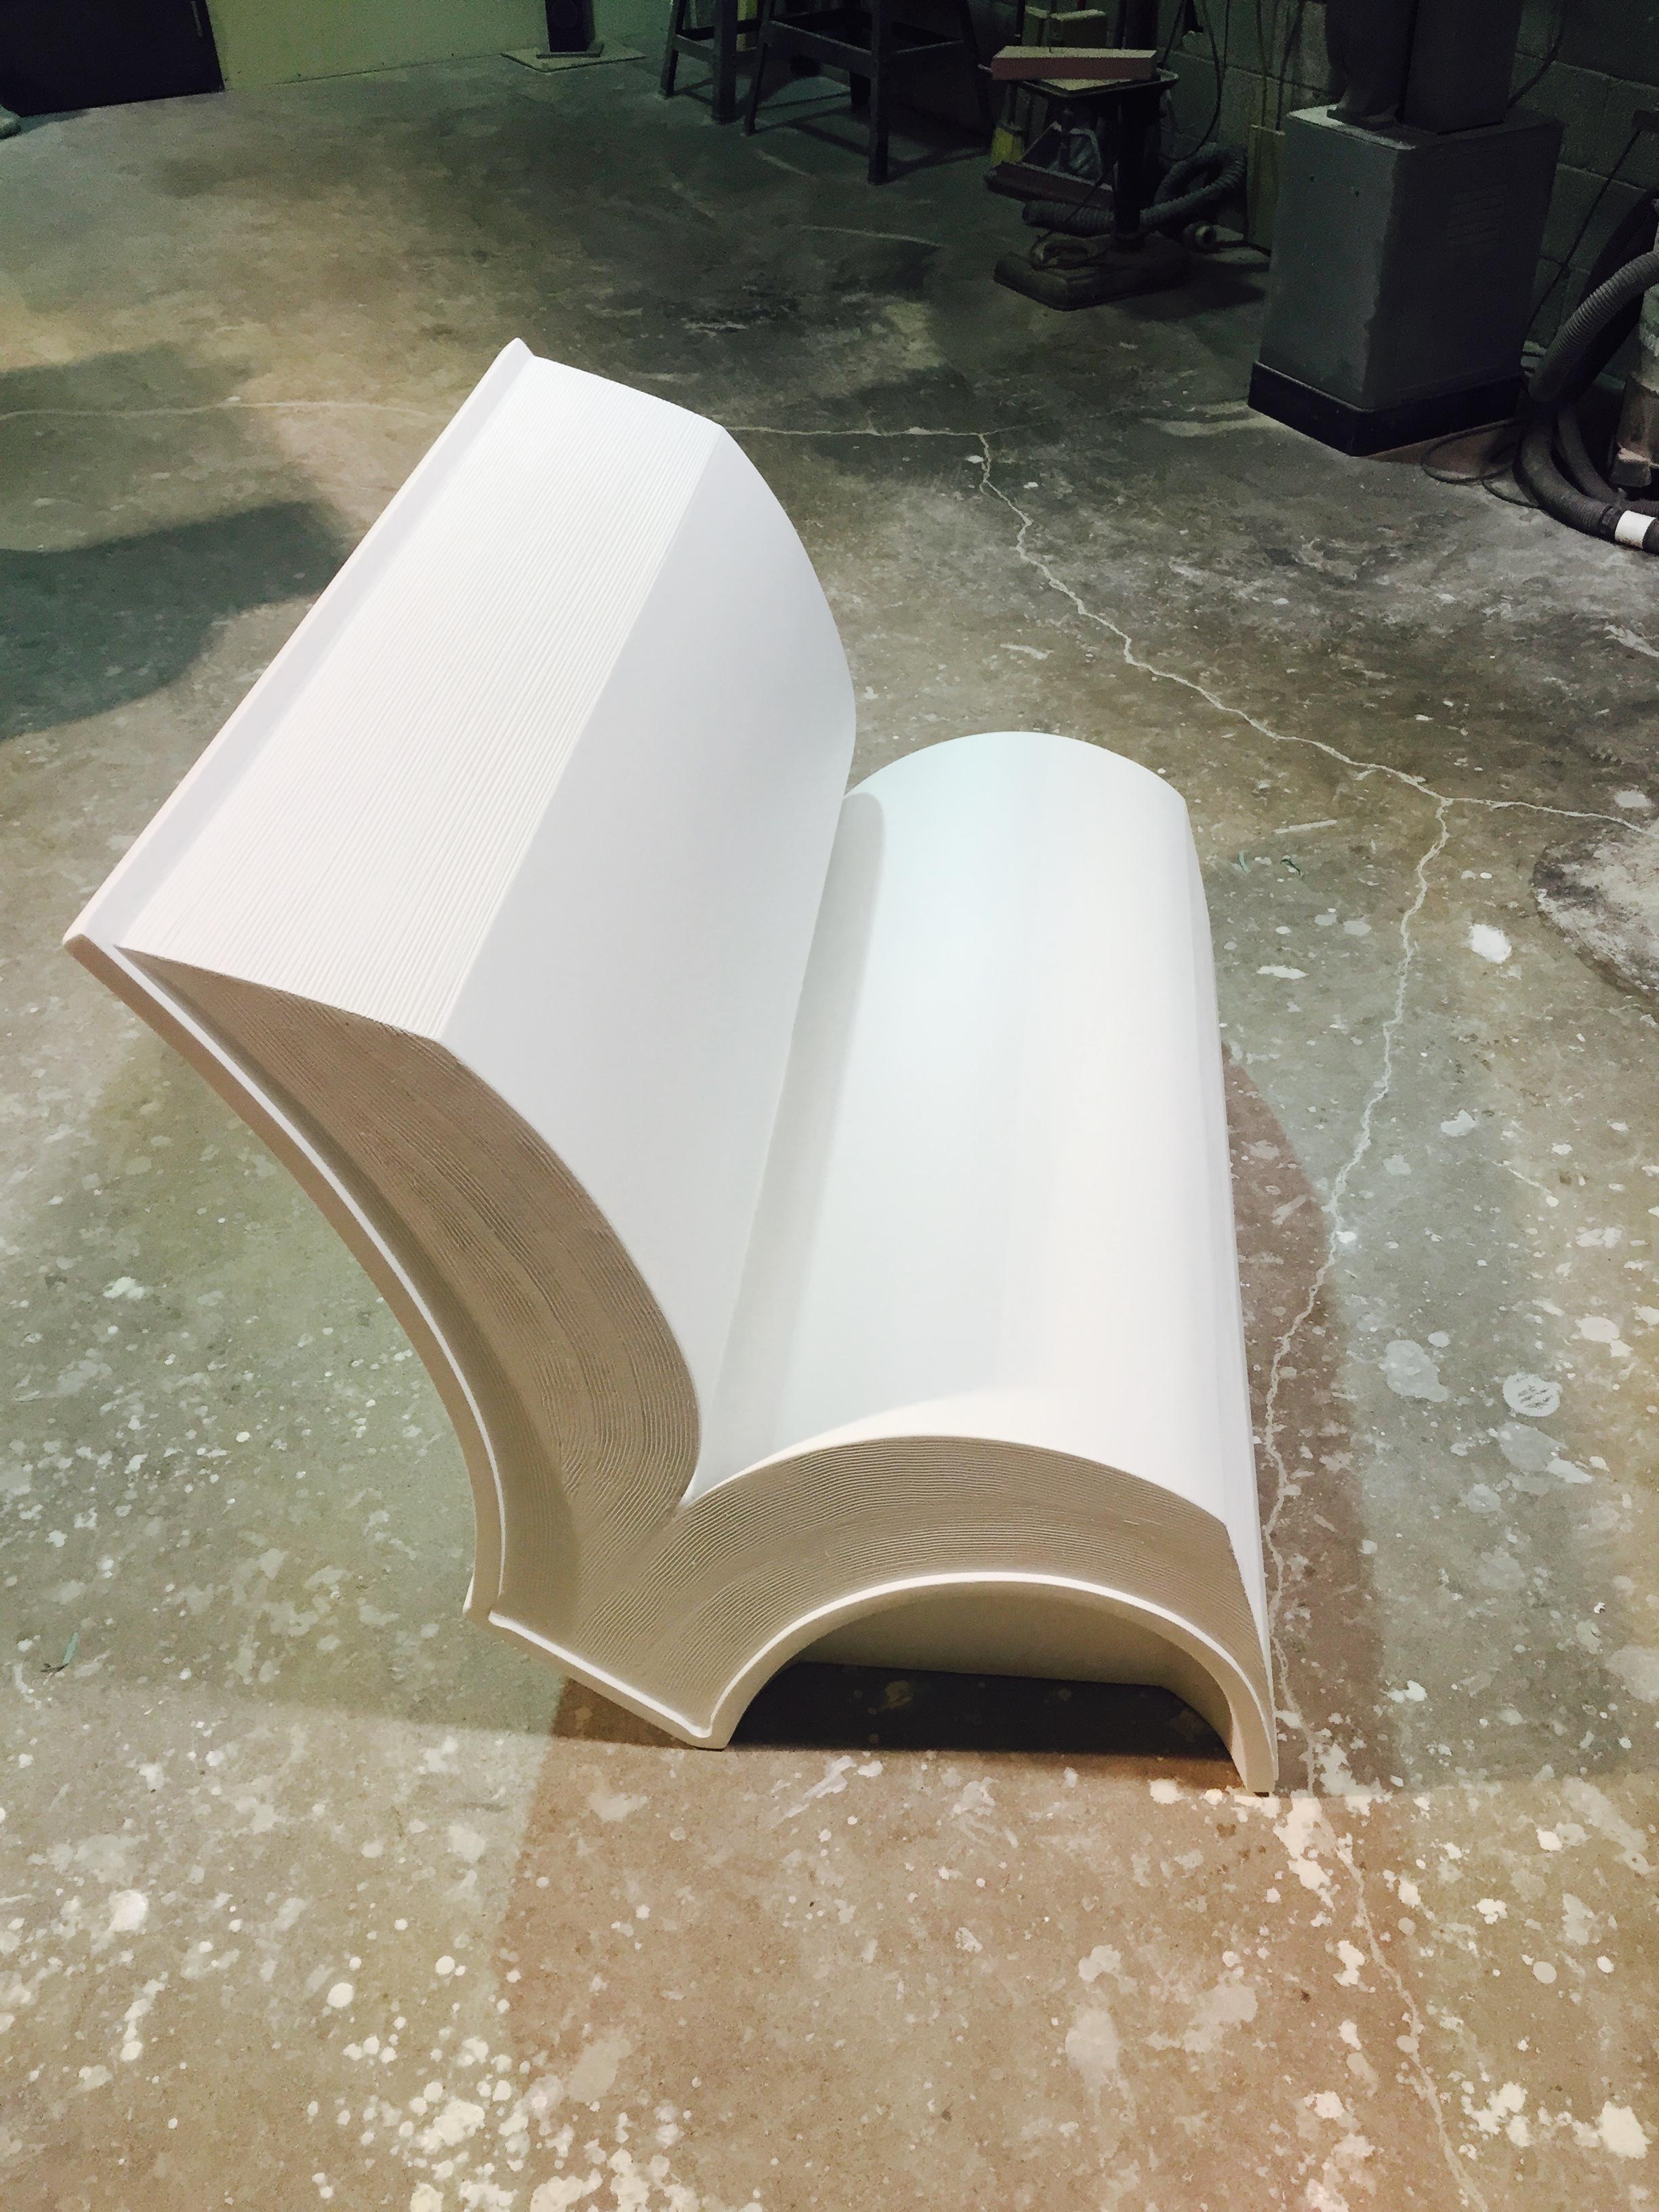 Finished Prototype fiberglass book bench